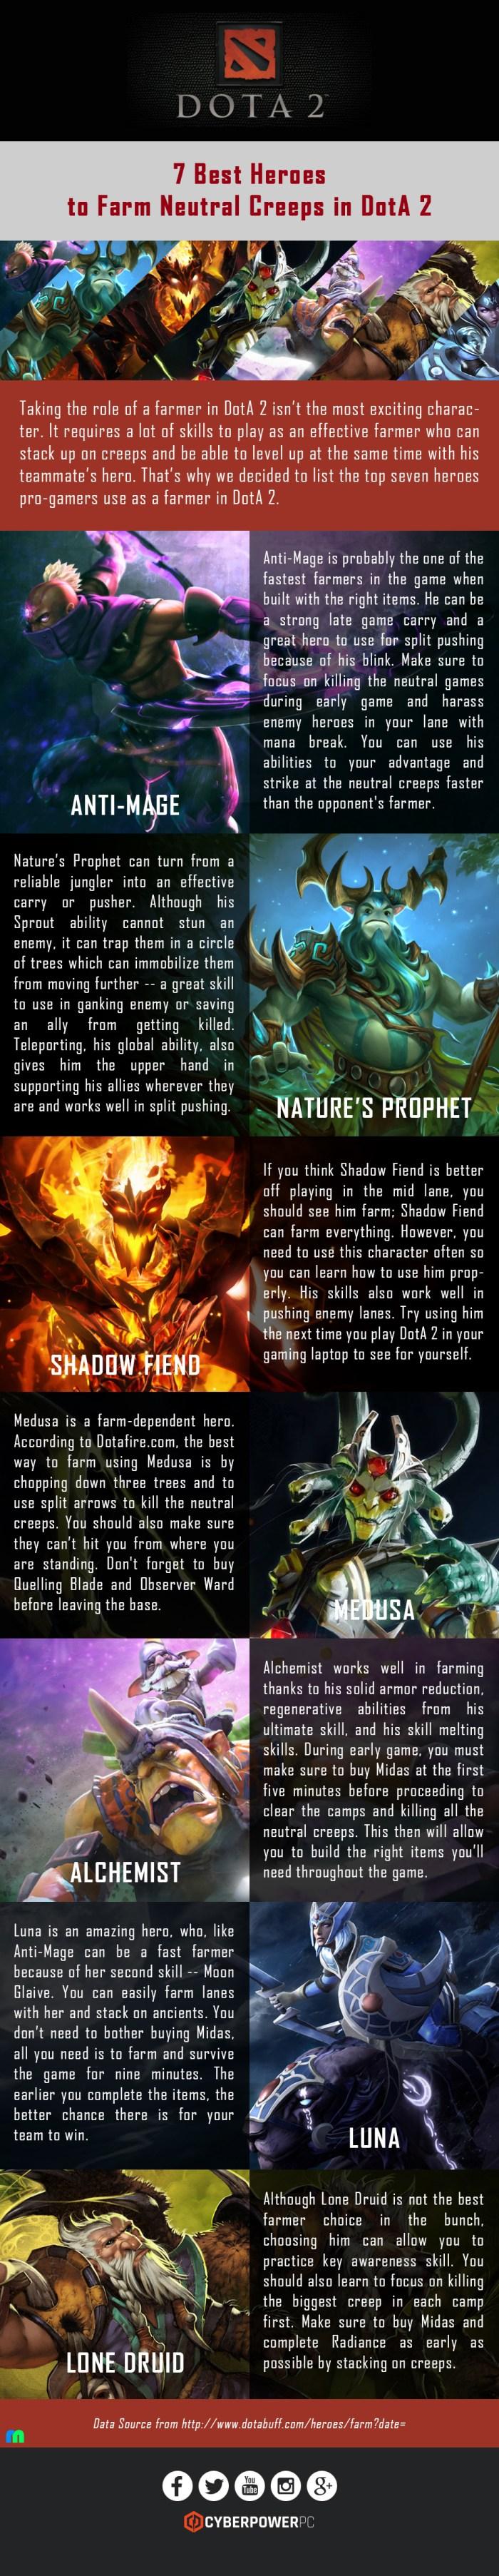 7 Best Heroes to Farm Neutral Creeps in DotA